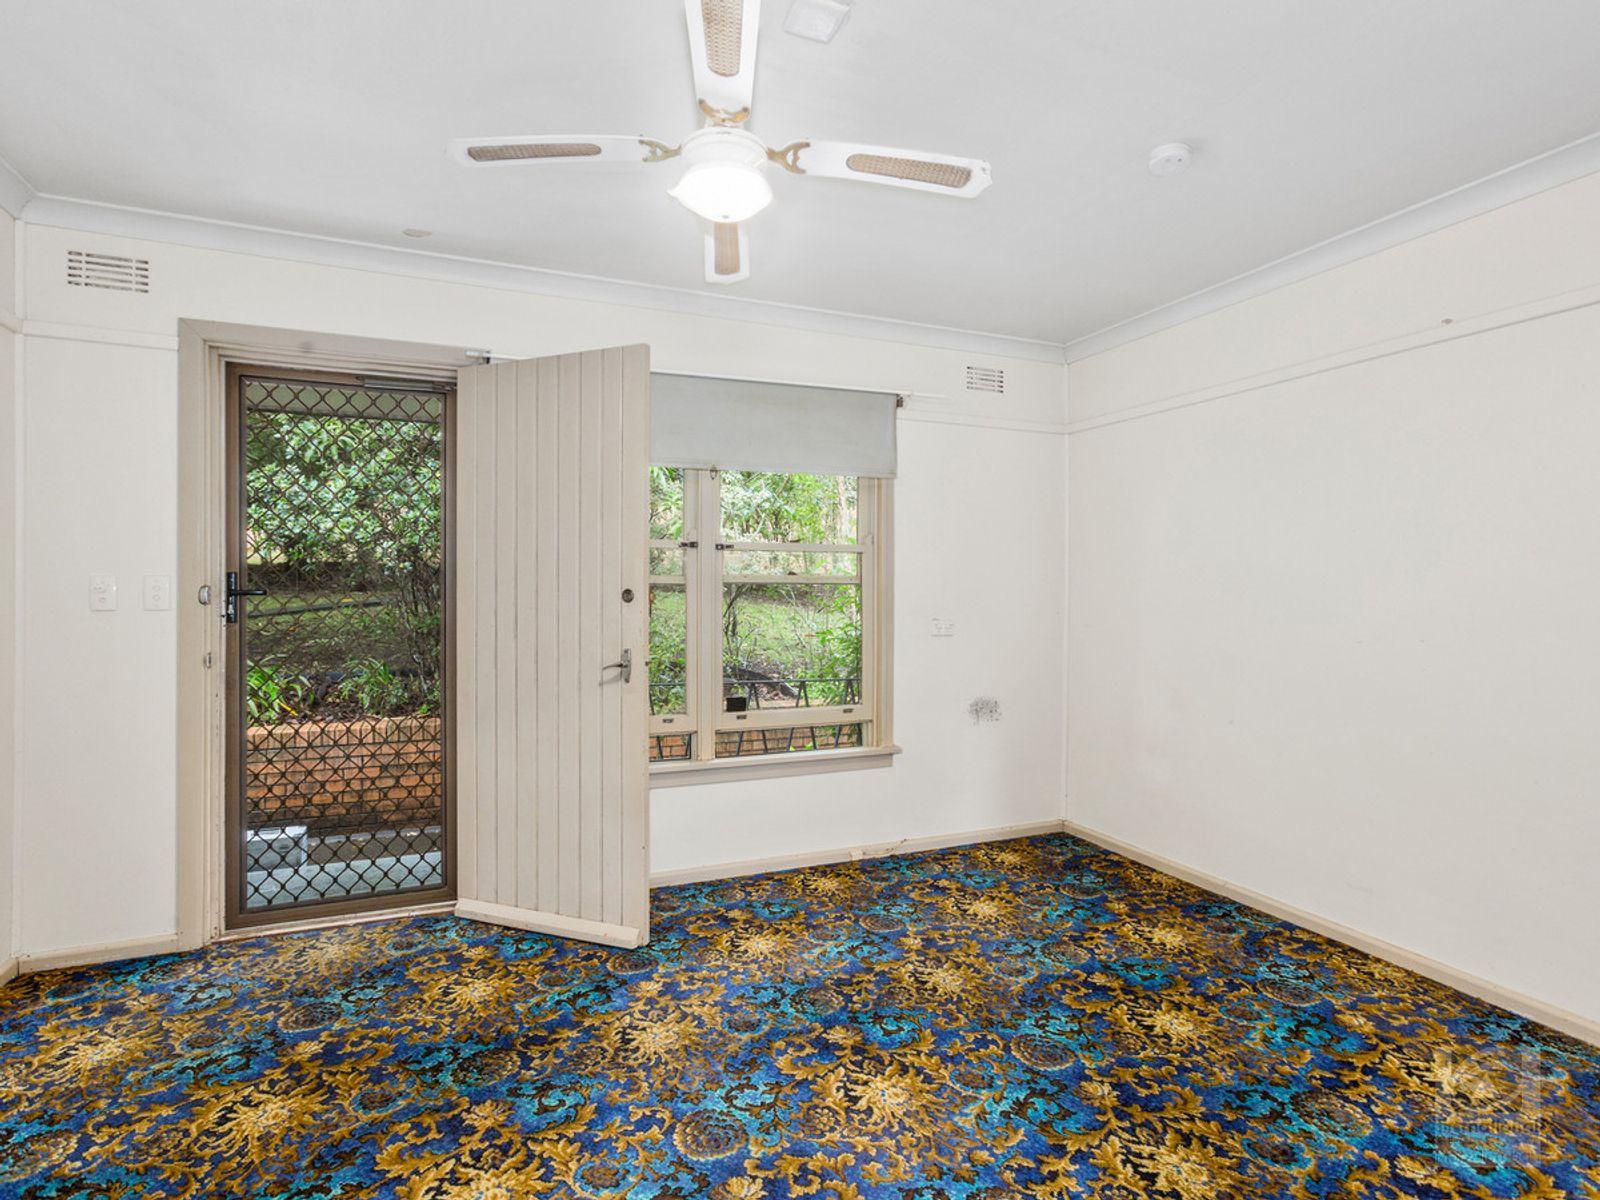 208 Murwillumbah Street, Murwillumbah, NSW 2484